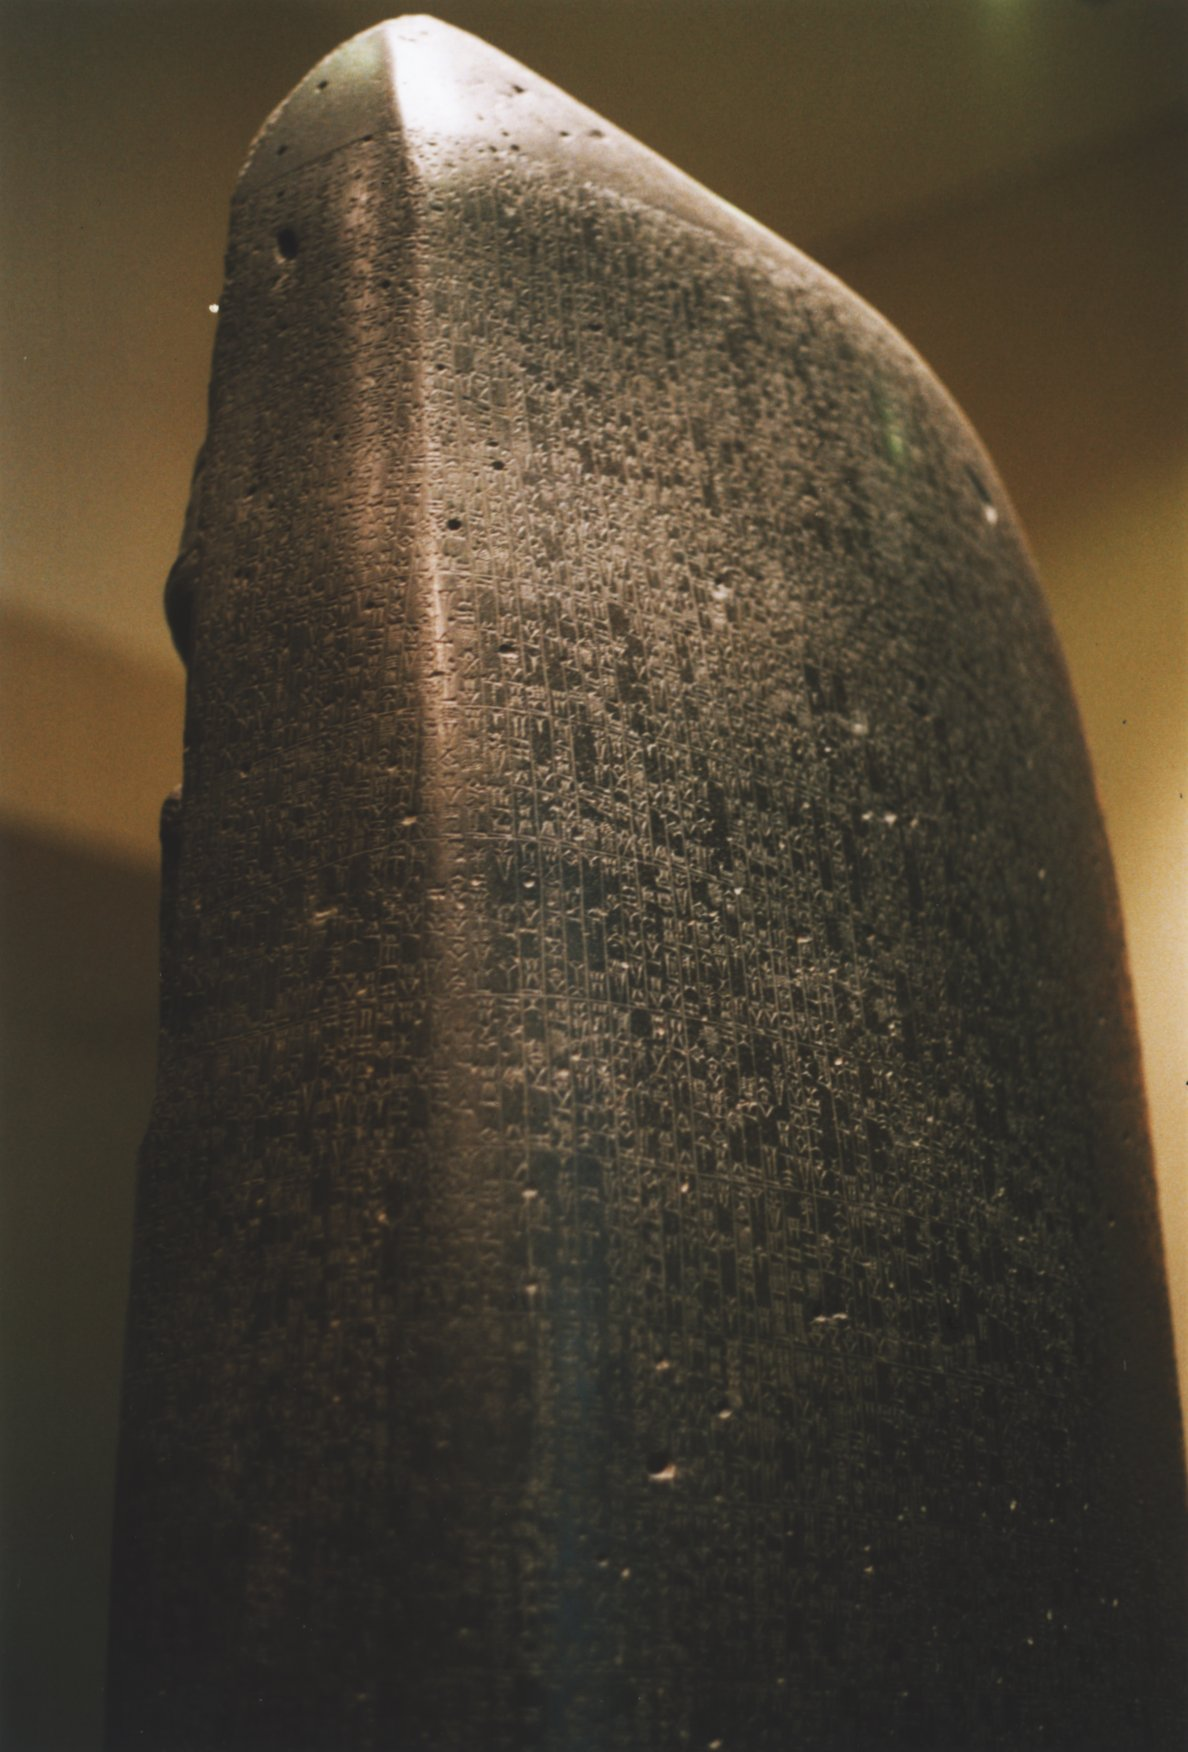 The Ancient Law Code Of Hammurabi